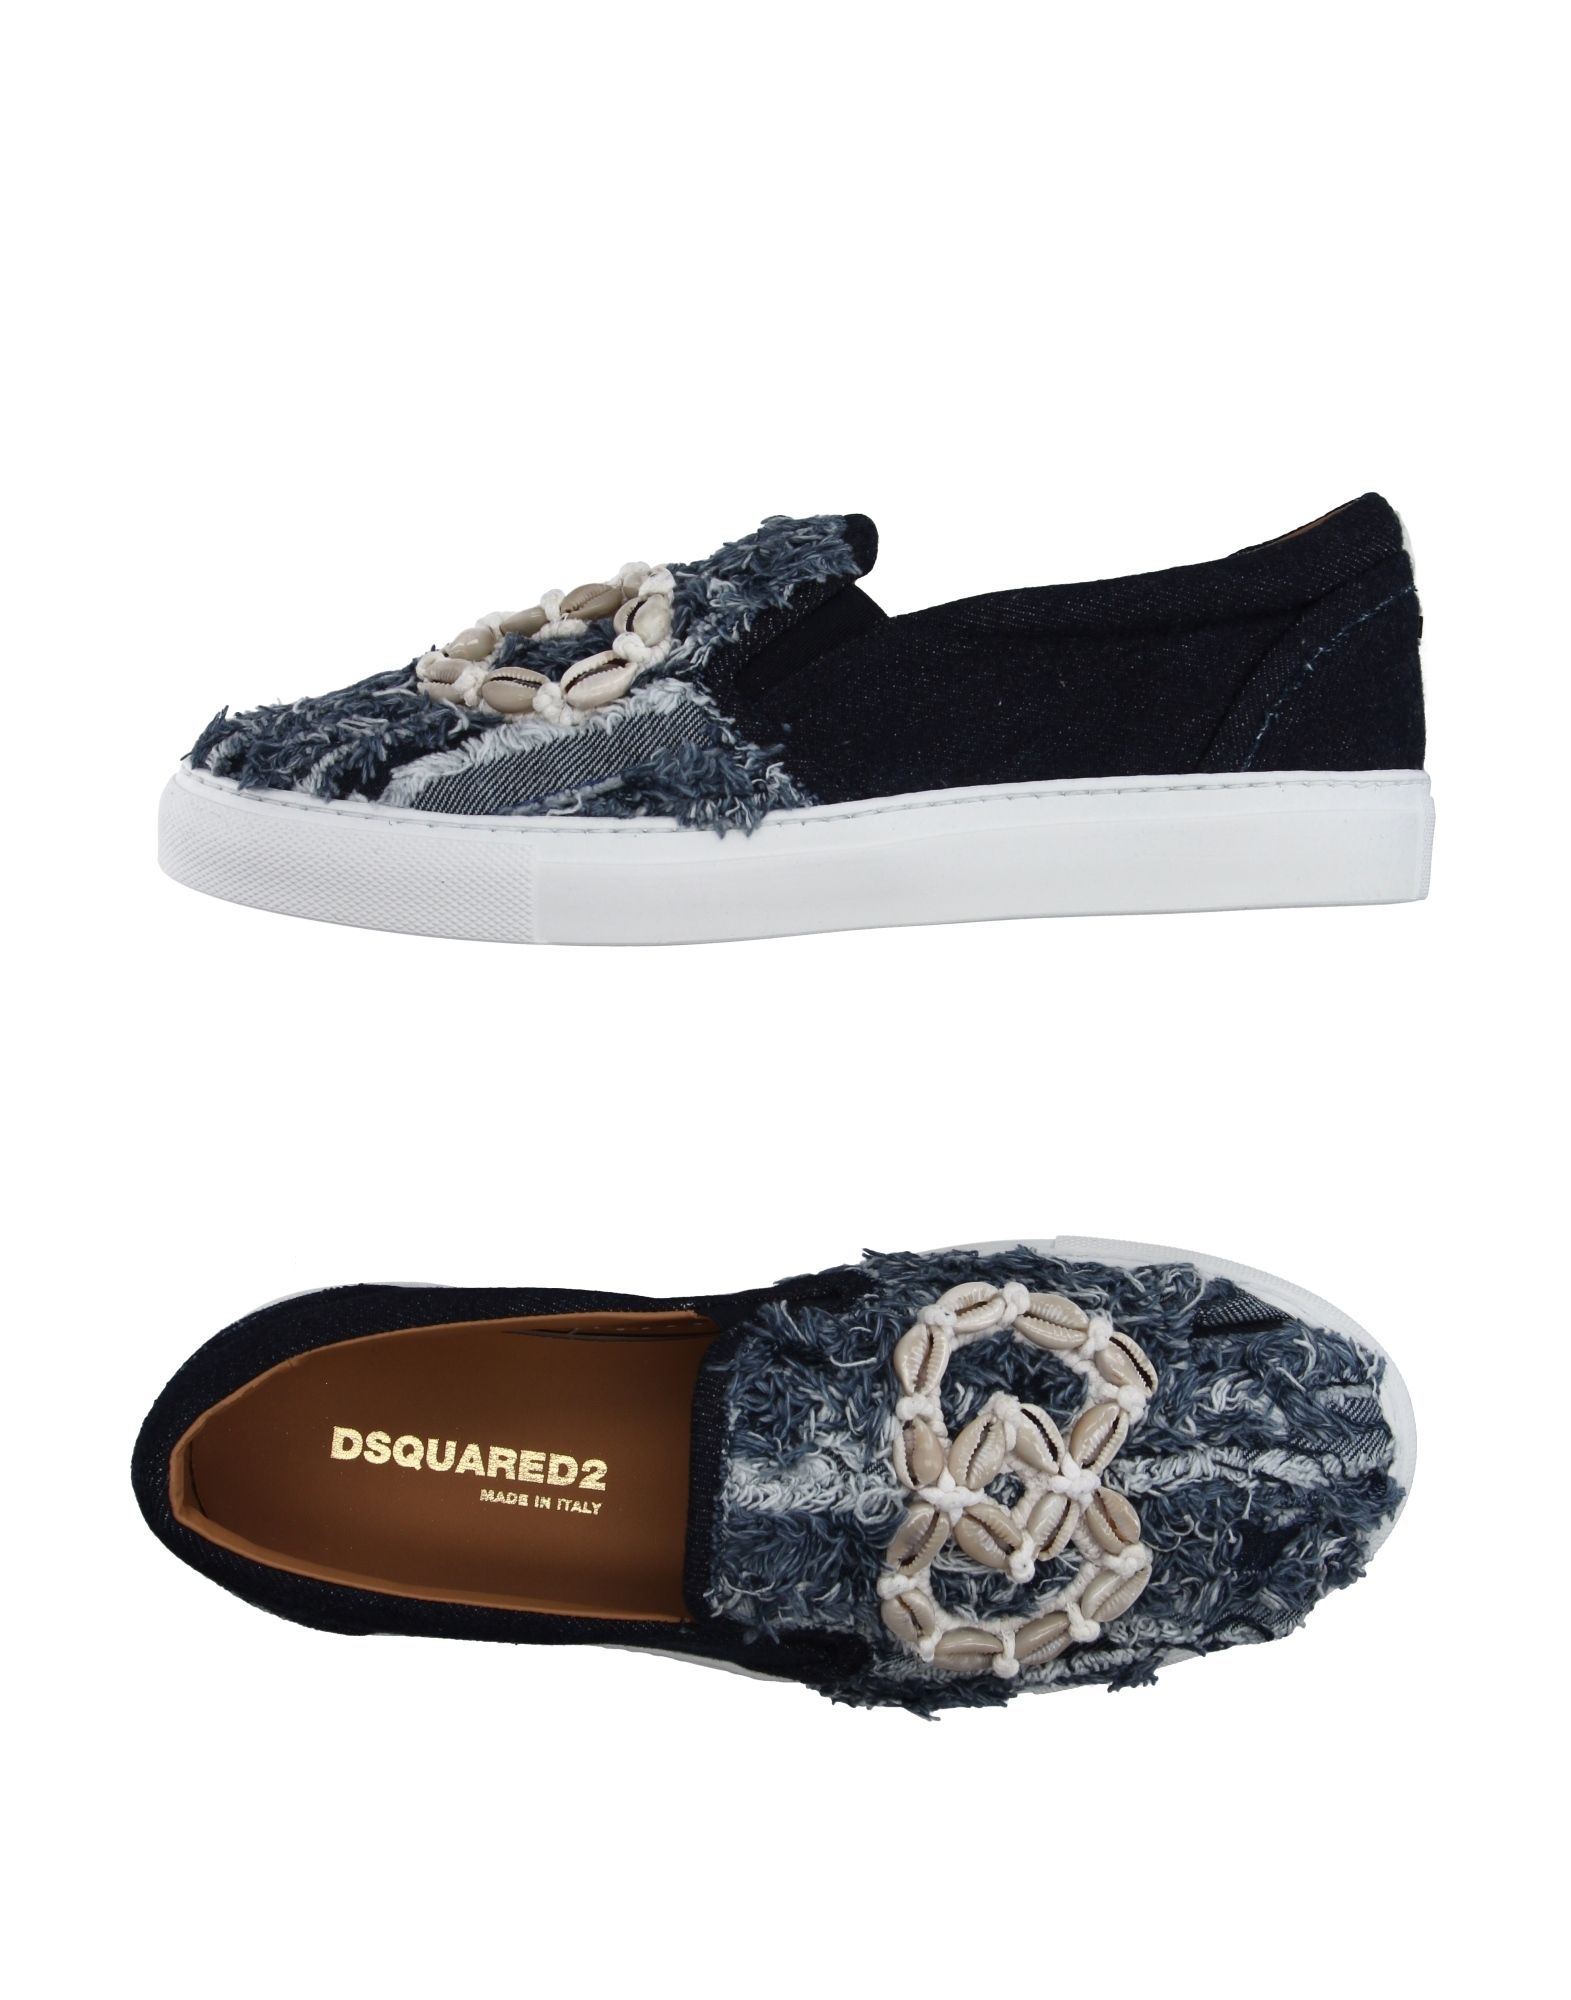 Rabatt Schuhe Dsquared2 Sneakers  Damen  Sneakers 11162085AI e8a1ac